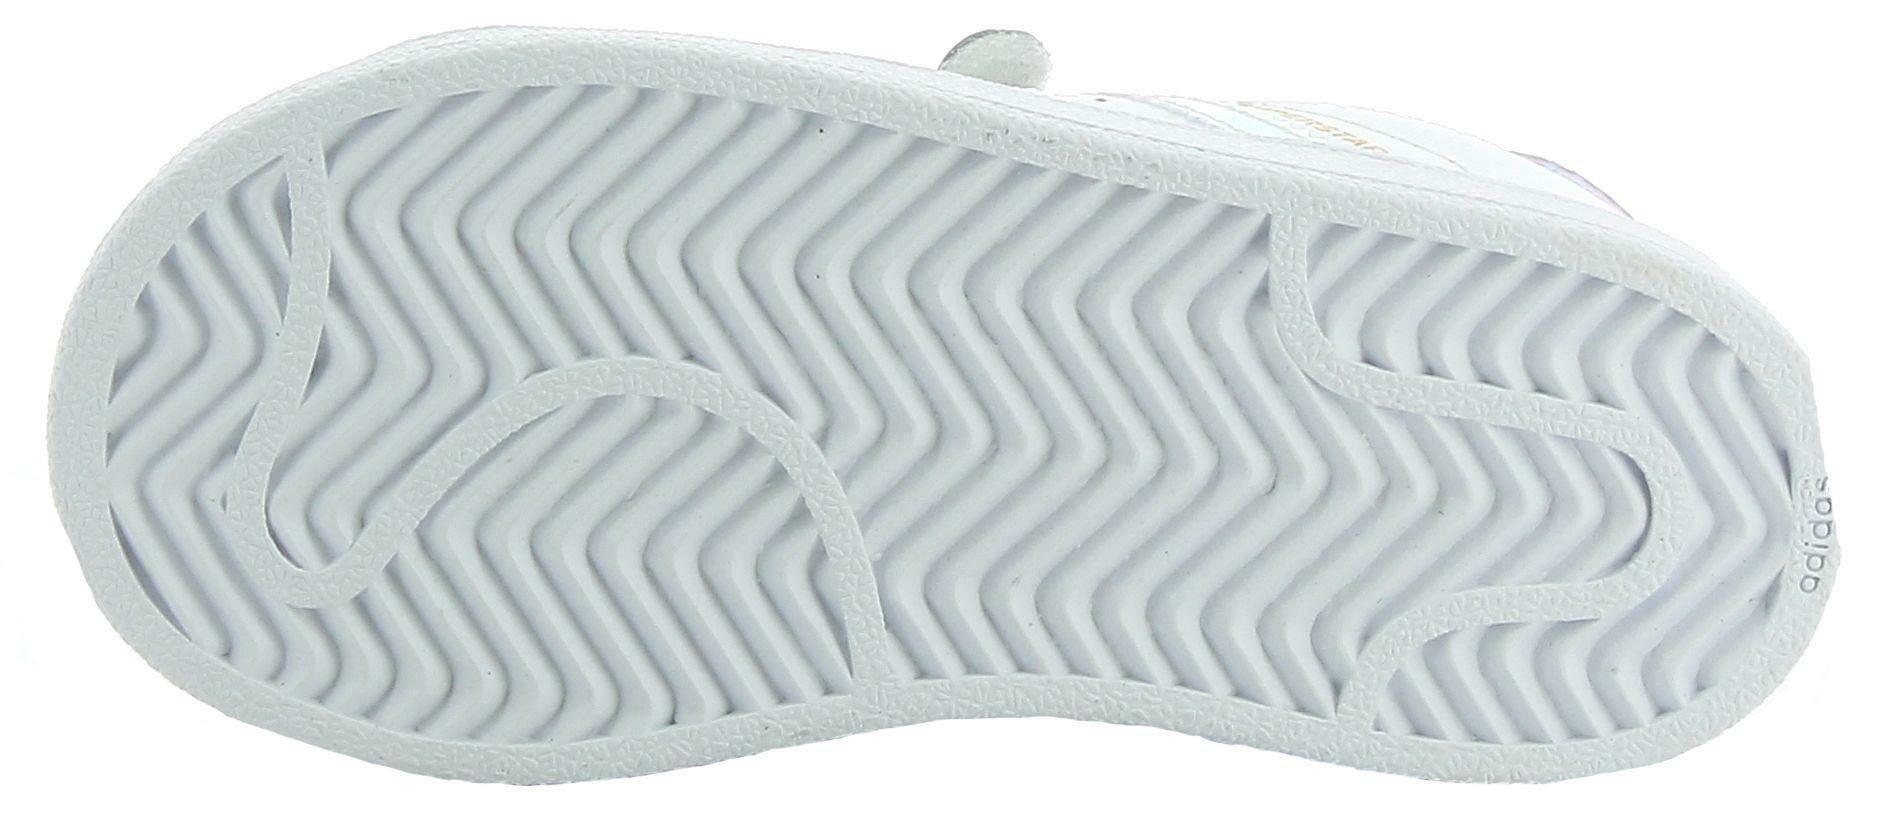 adidas adidas superstar cf i scarpe sportive bambina bianche